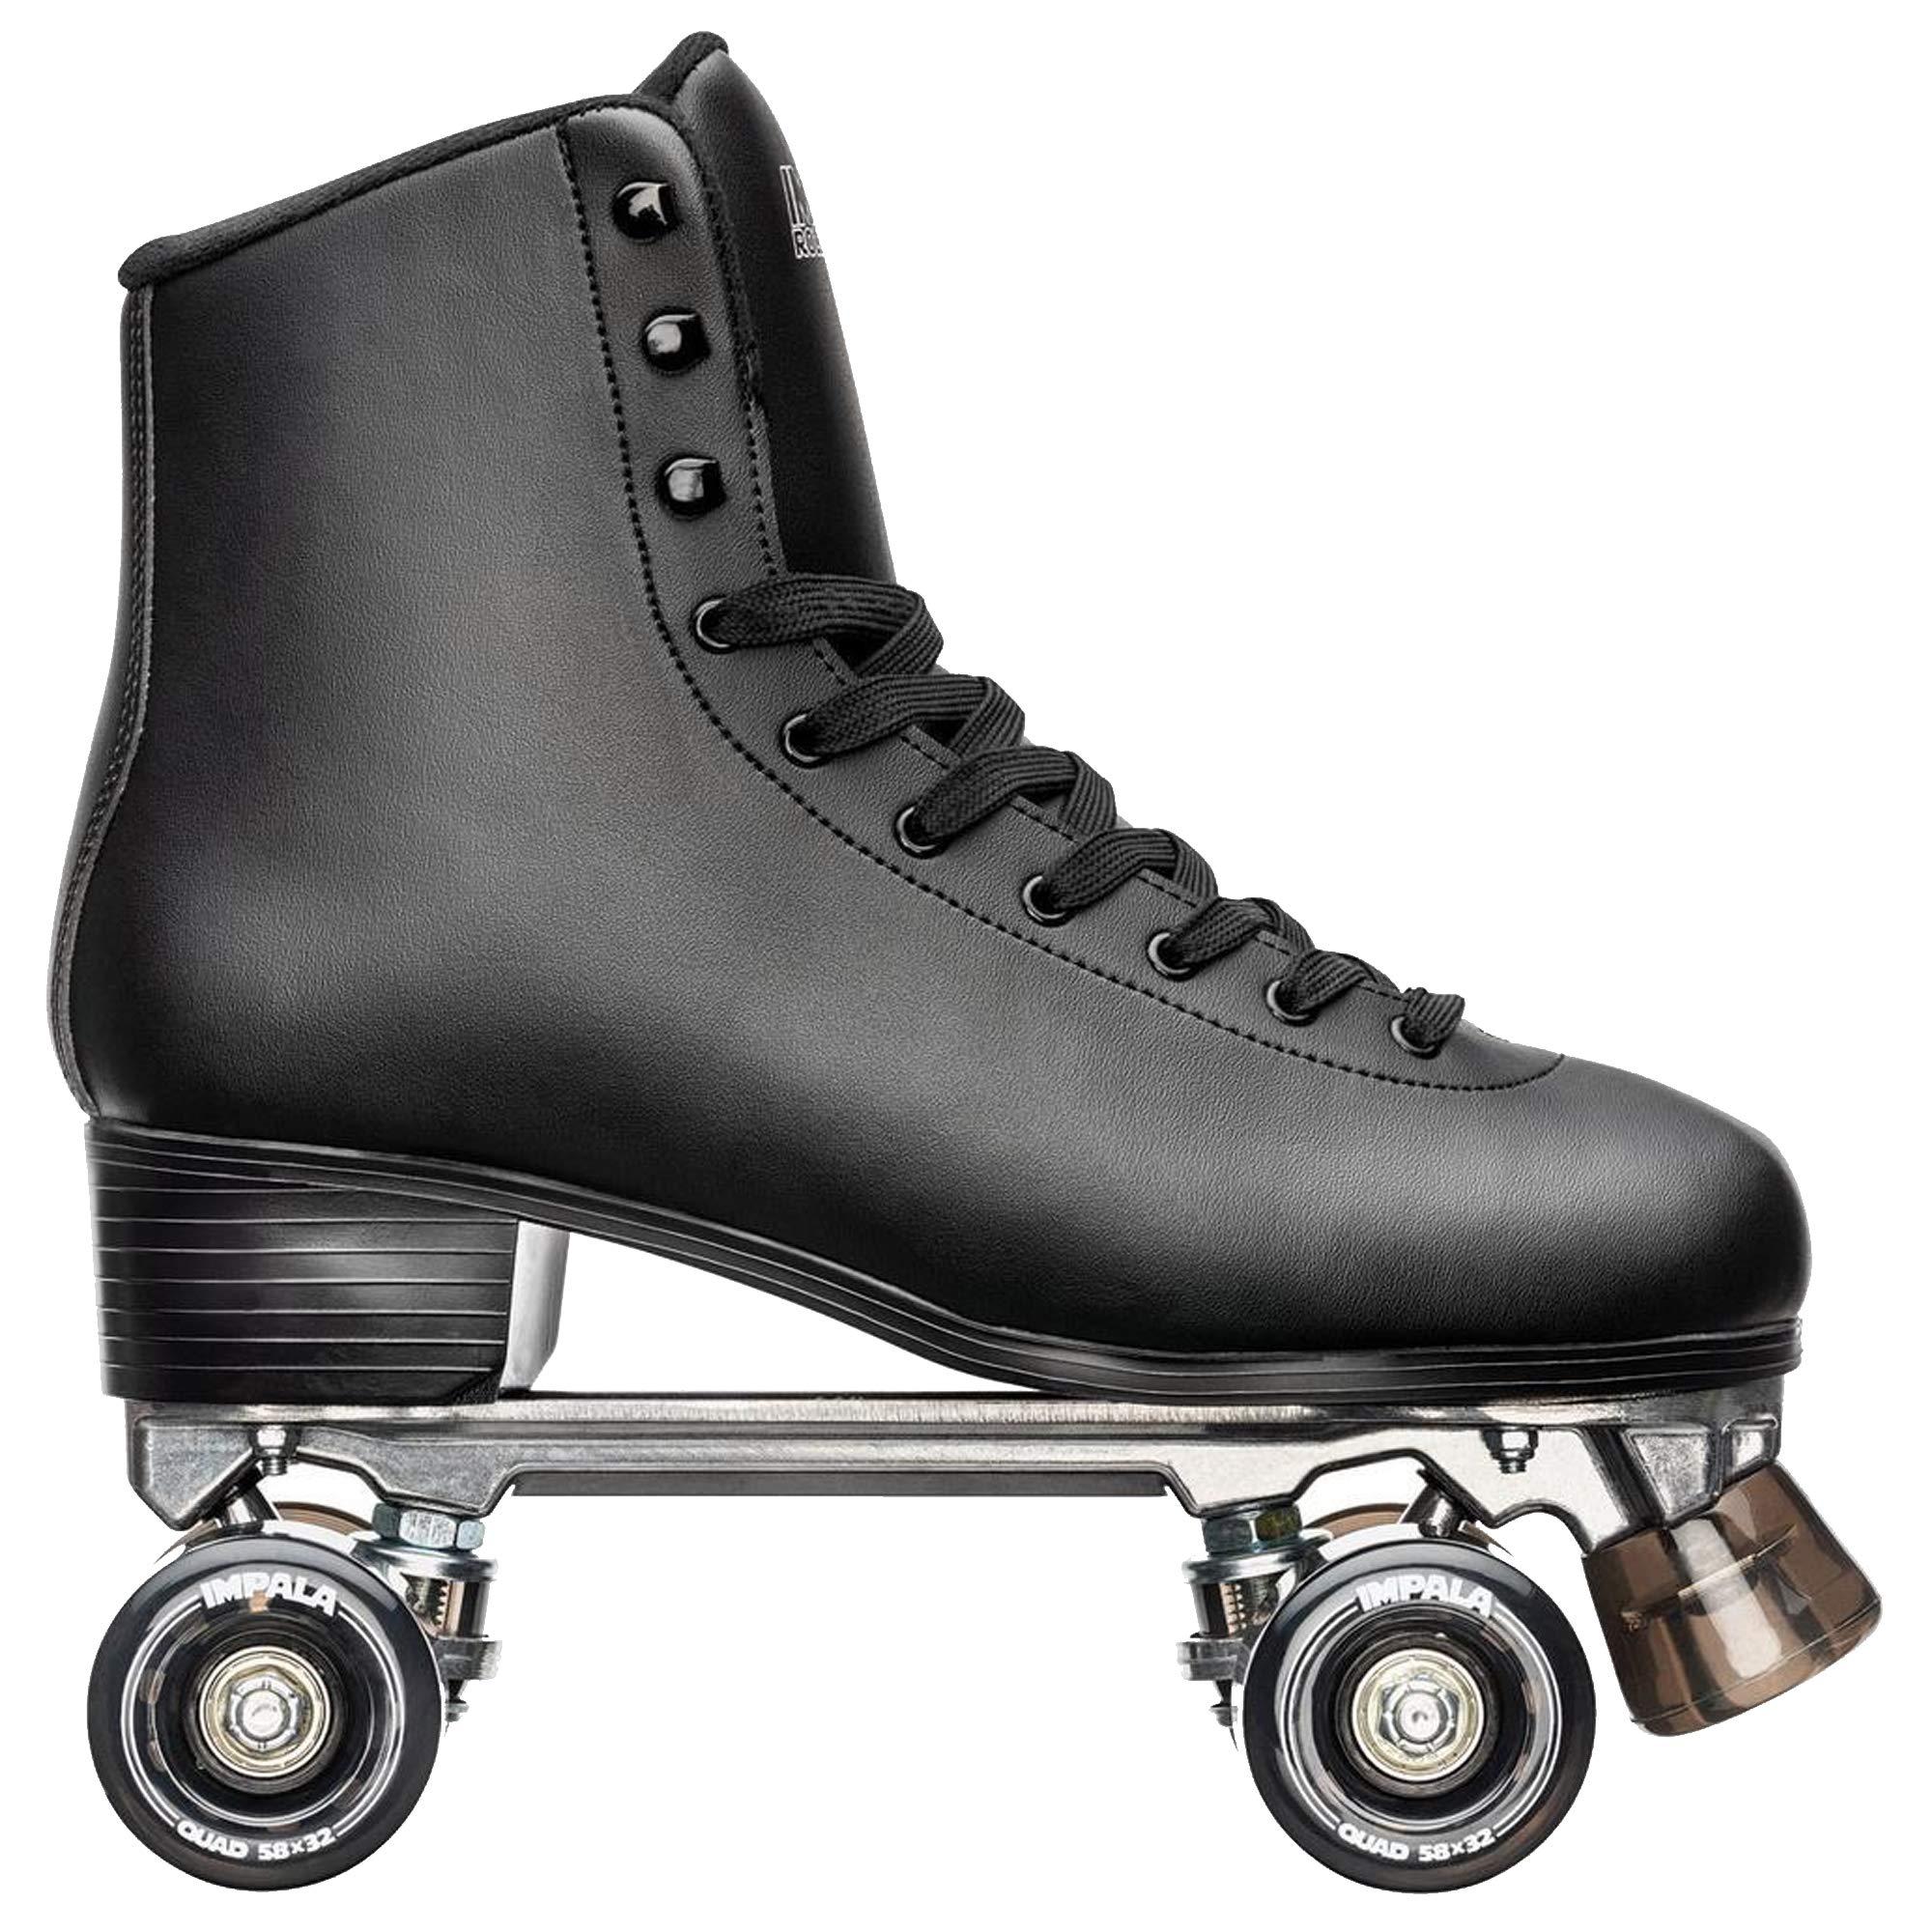 Impala Rollerskates Unisex Impala Quad Skate (Big Kid/Adult) Black 7 (US Men's 5, Women's 7) M